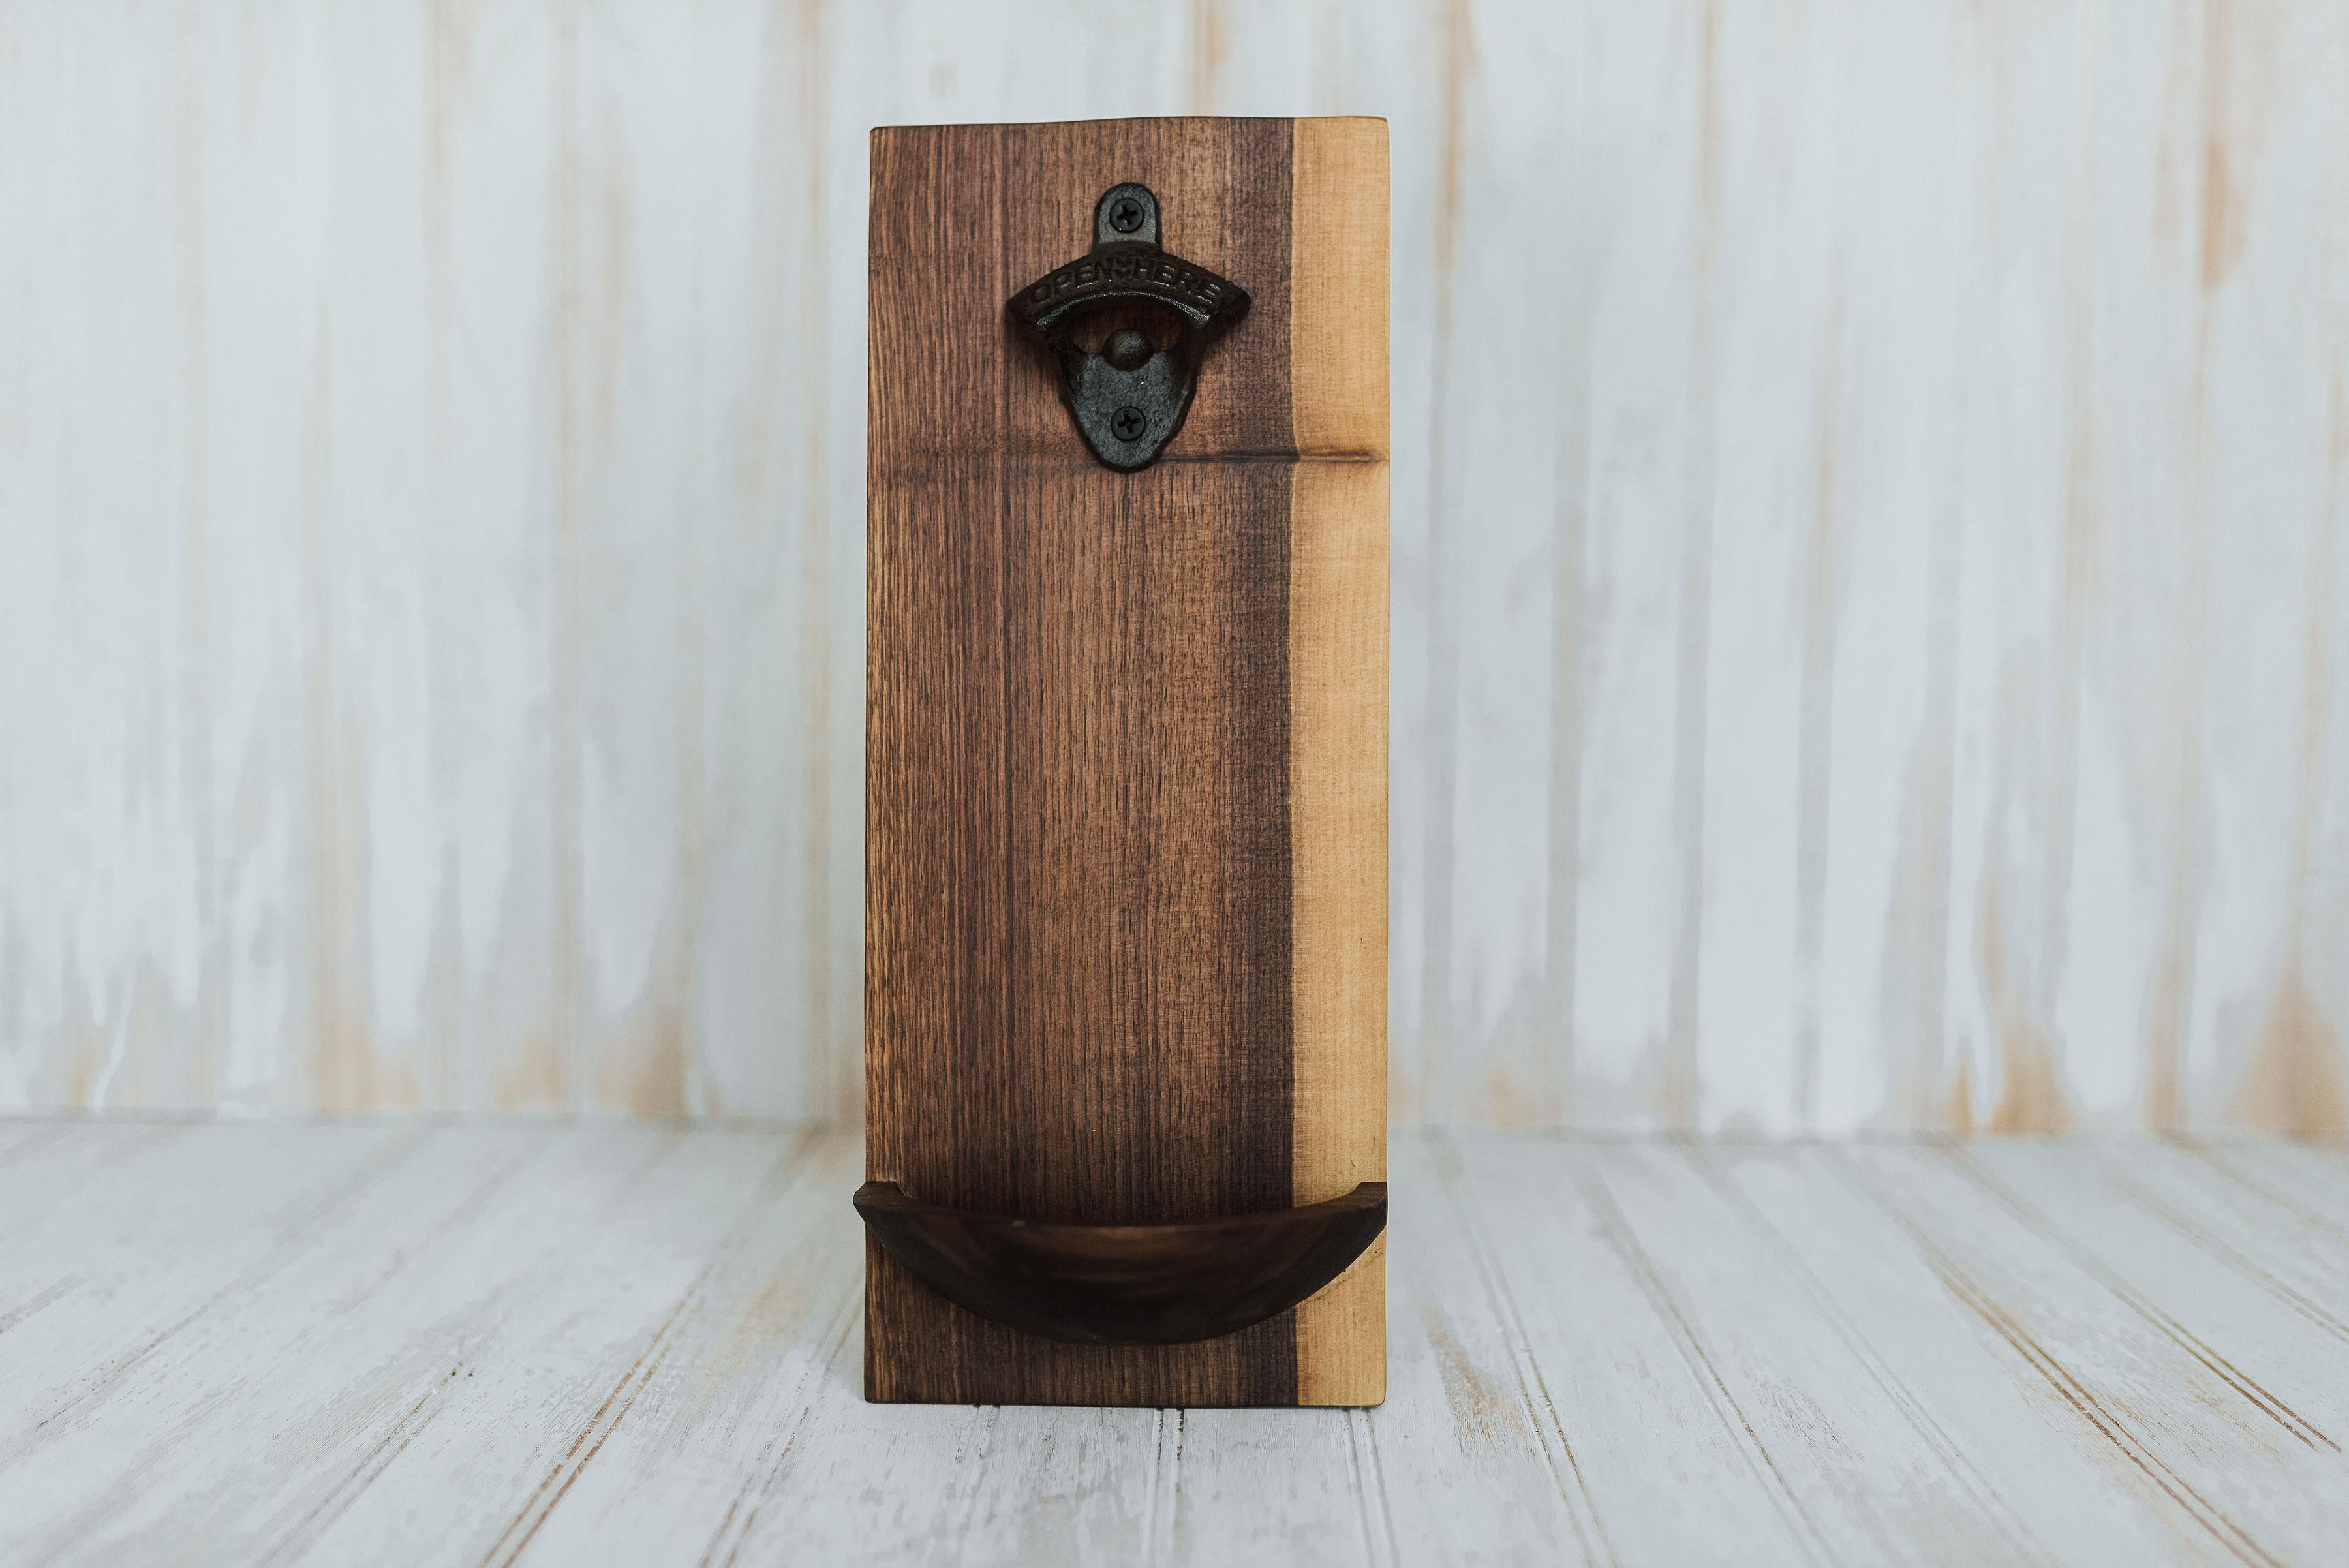 Image of: Wooden Wall Mounted Bottle Openers Walnut Finish